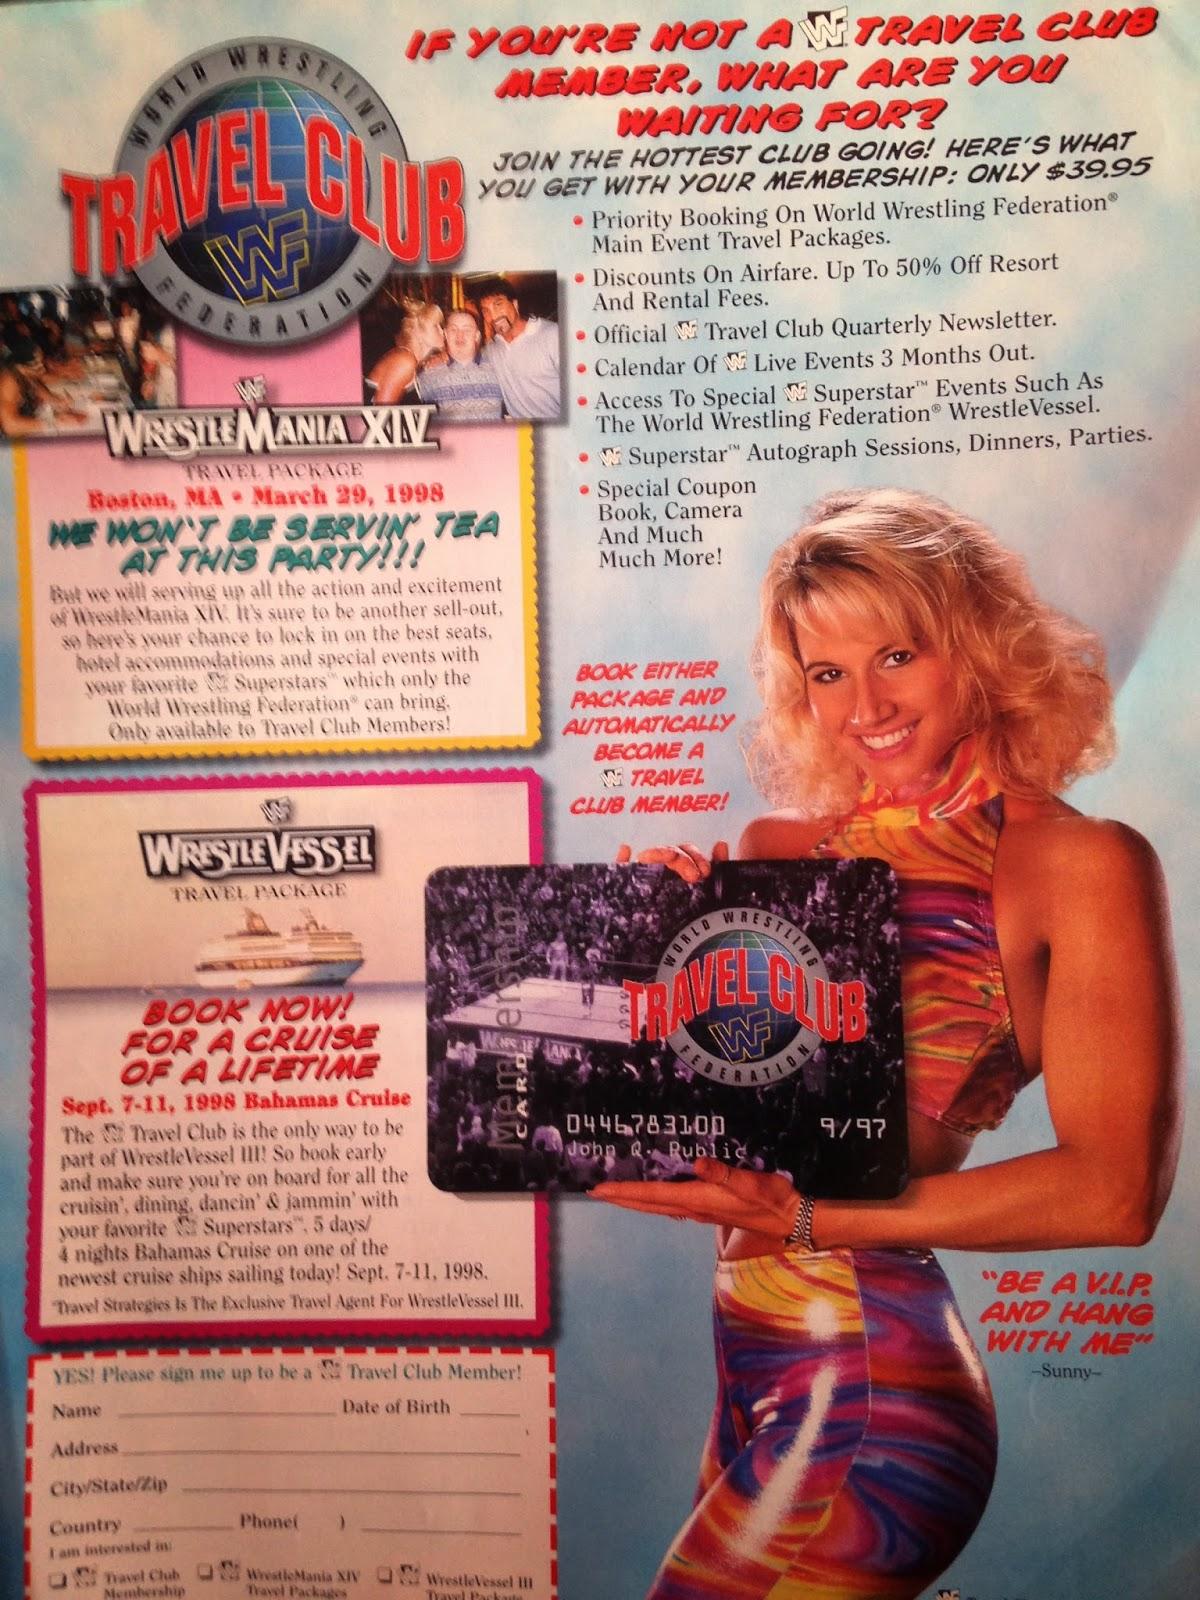 WWE: WWF RAW MAGAZINE - January 1998 - Sunny promotes the WWE travel club